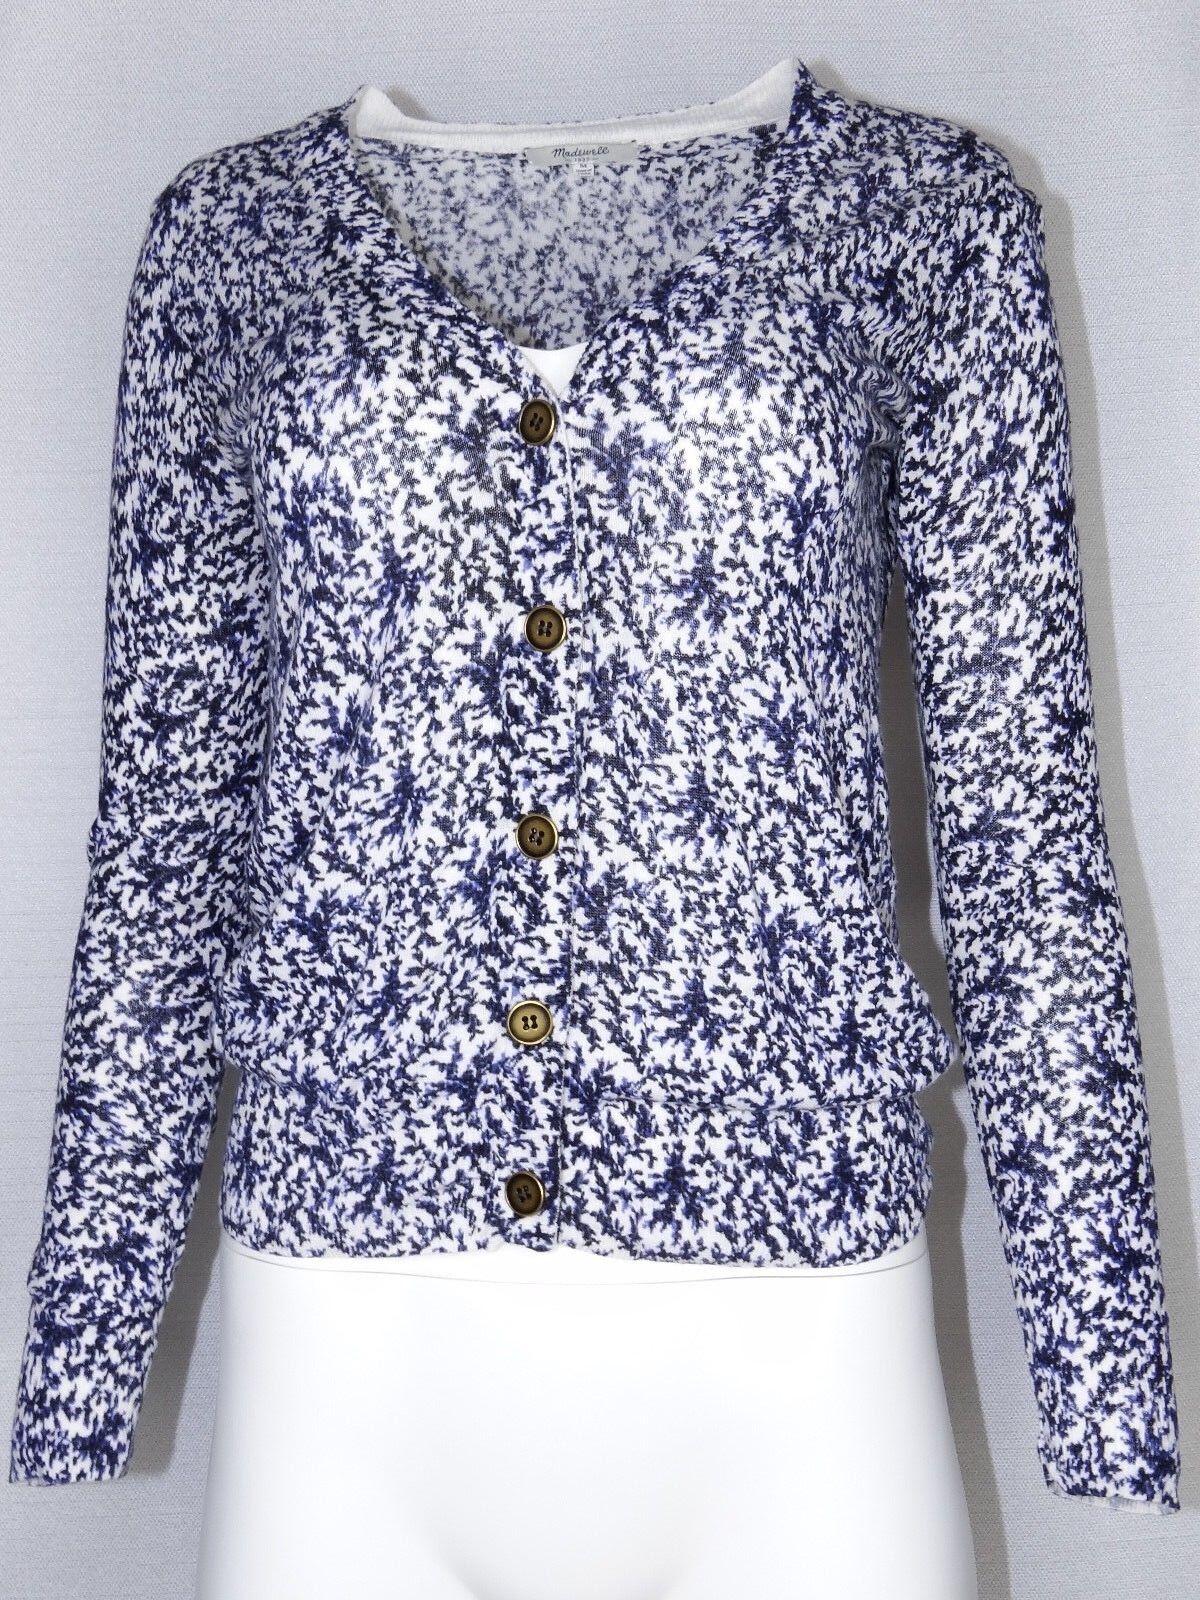 Madewell 1937 Sm-Medium Cardigan Sweater Button White Floral Vine 46431